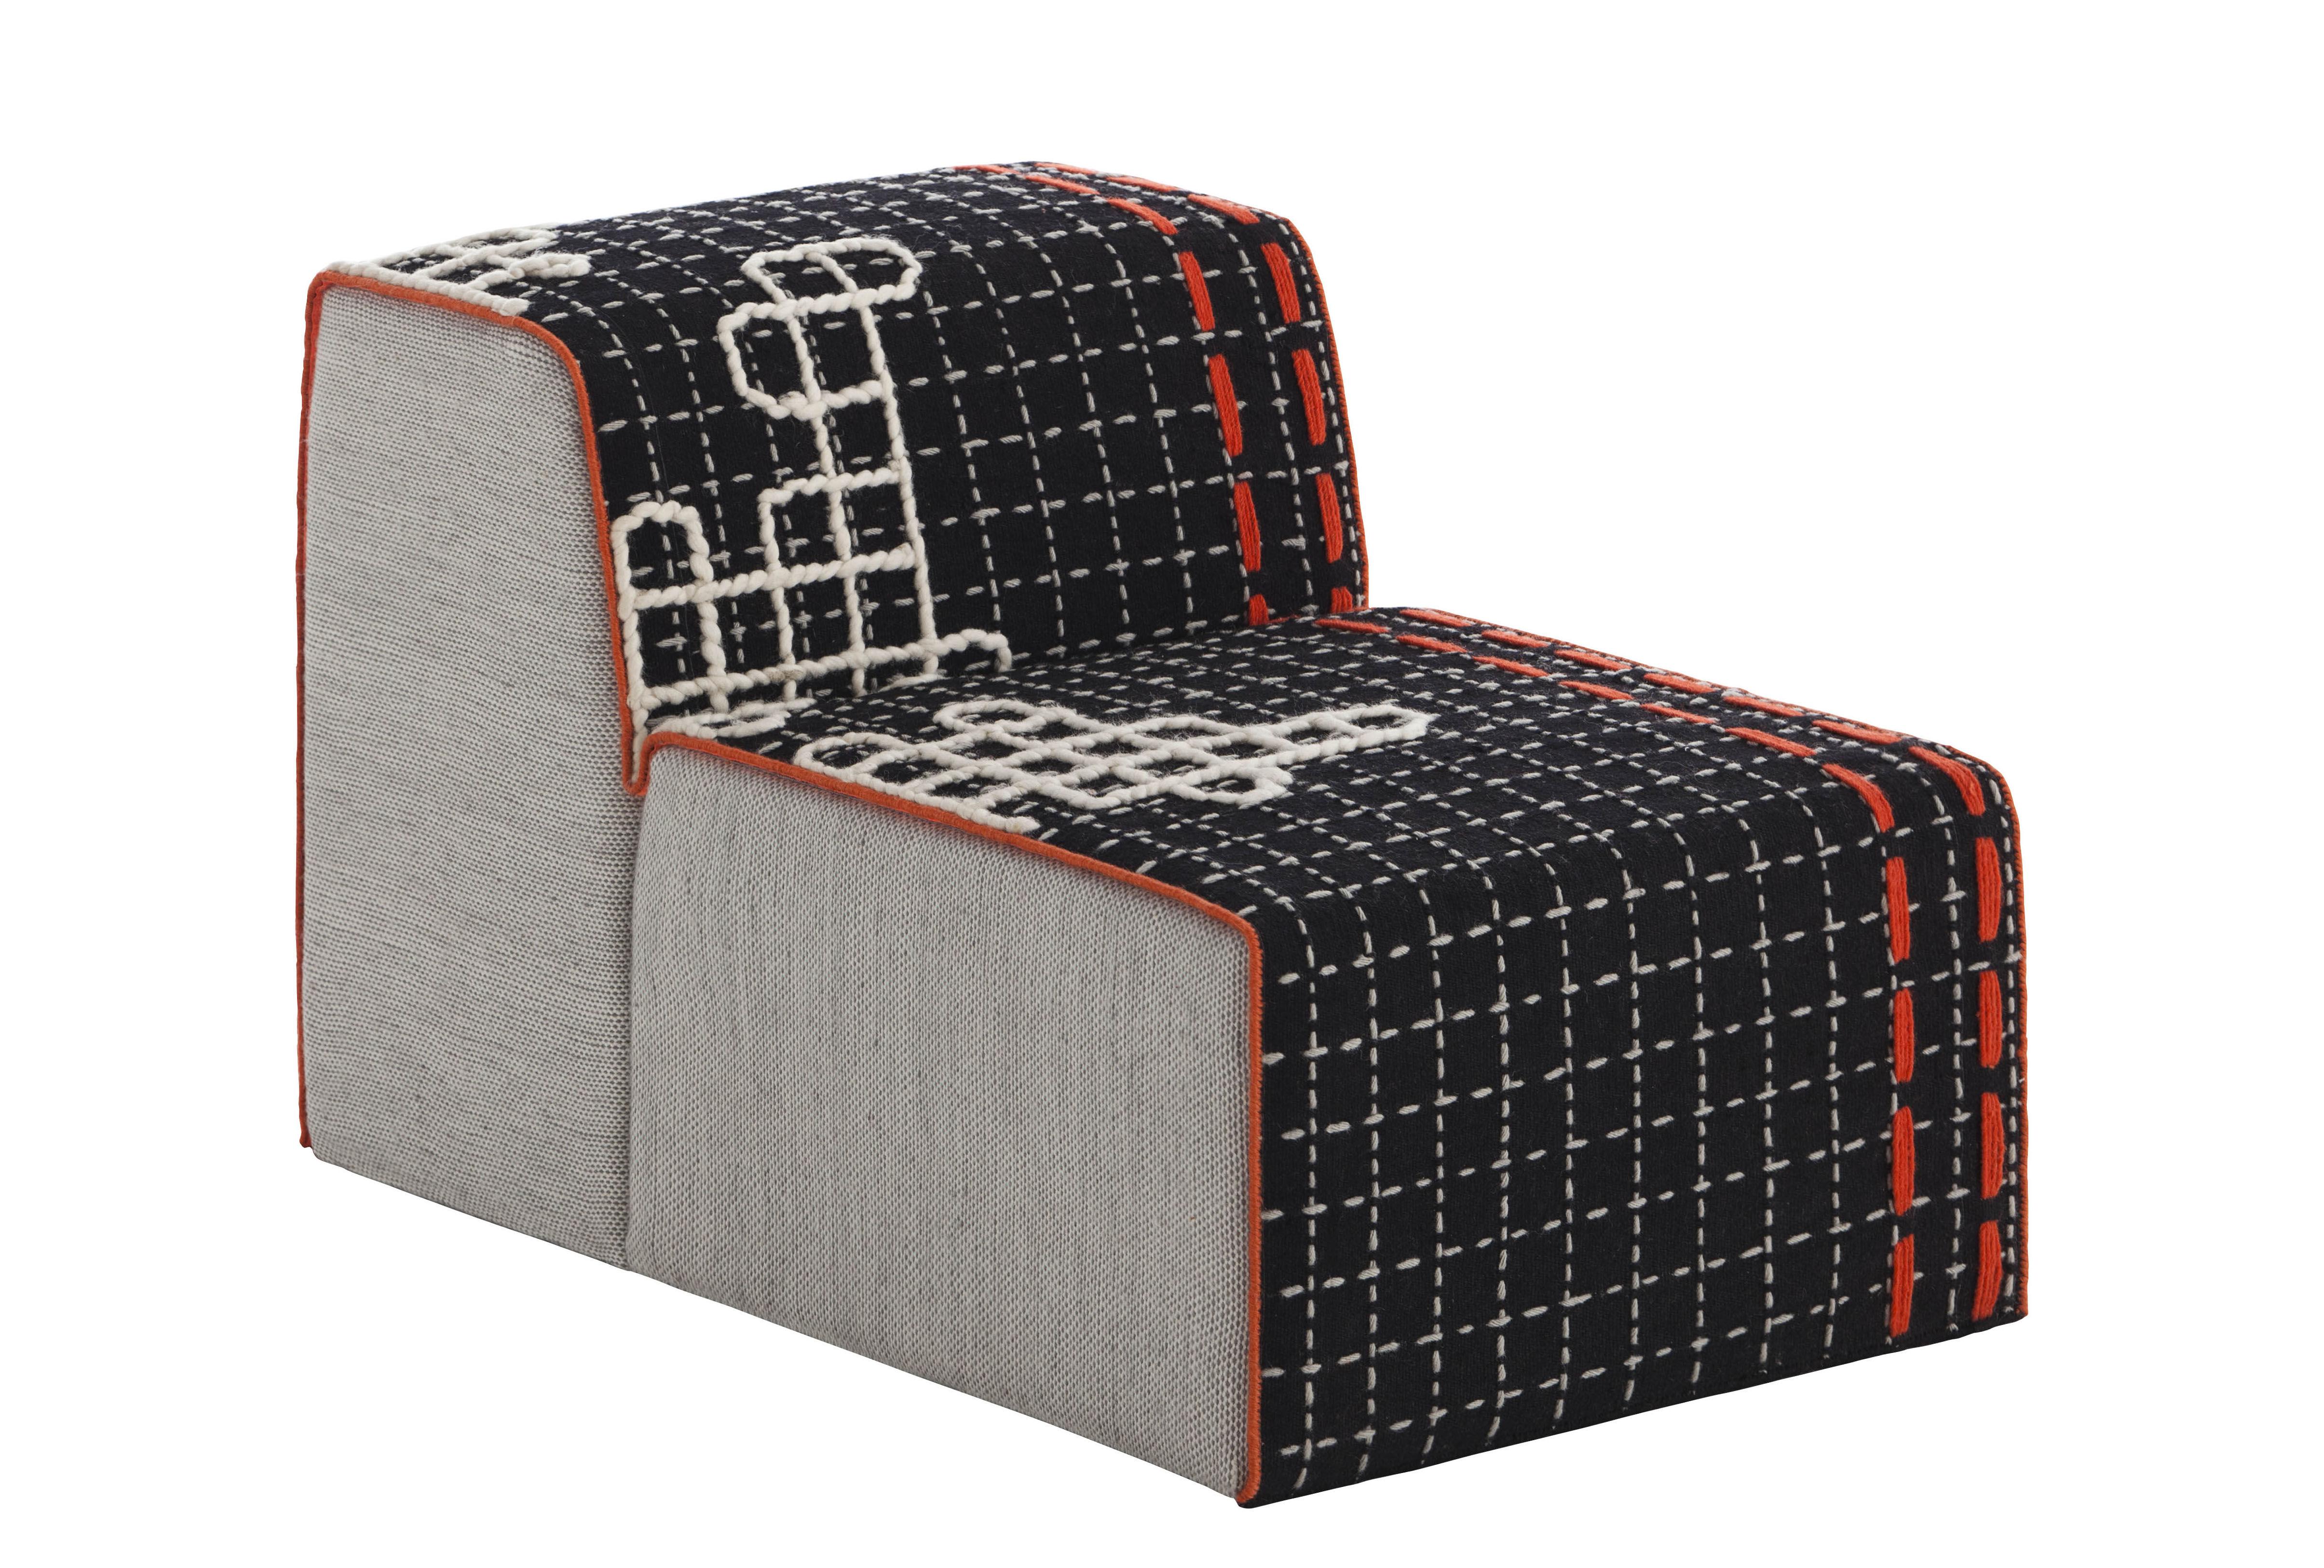 Furniture - Sofas - Bandas Modular sofa - L 95 cm by Gan - Black - Wool